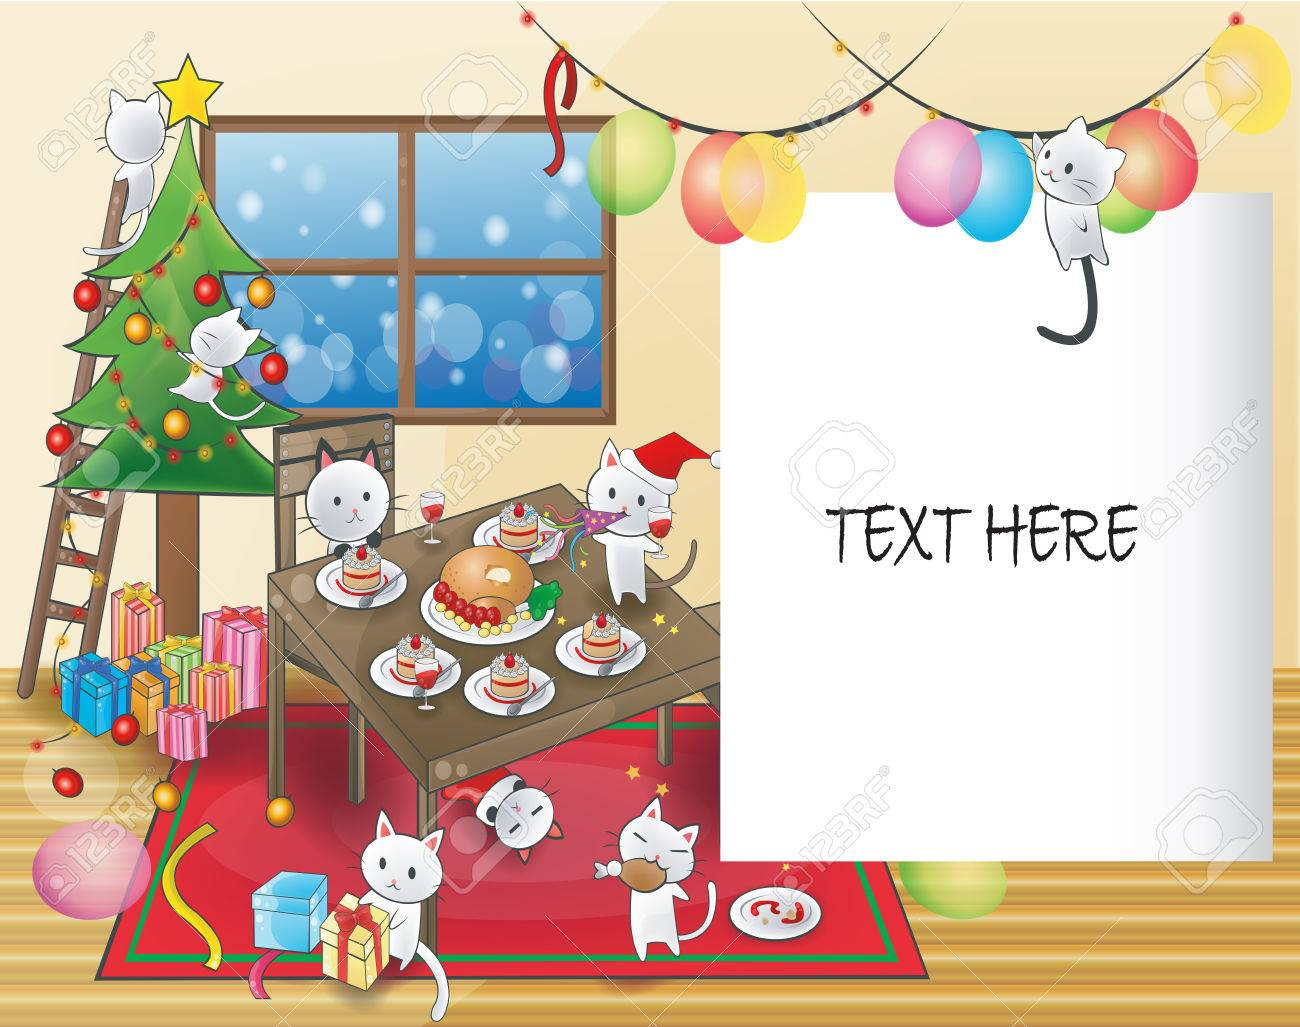 Weihnachtsfeier Cartoon.Stock Photo